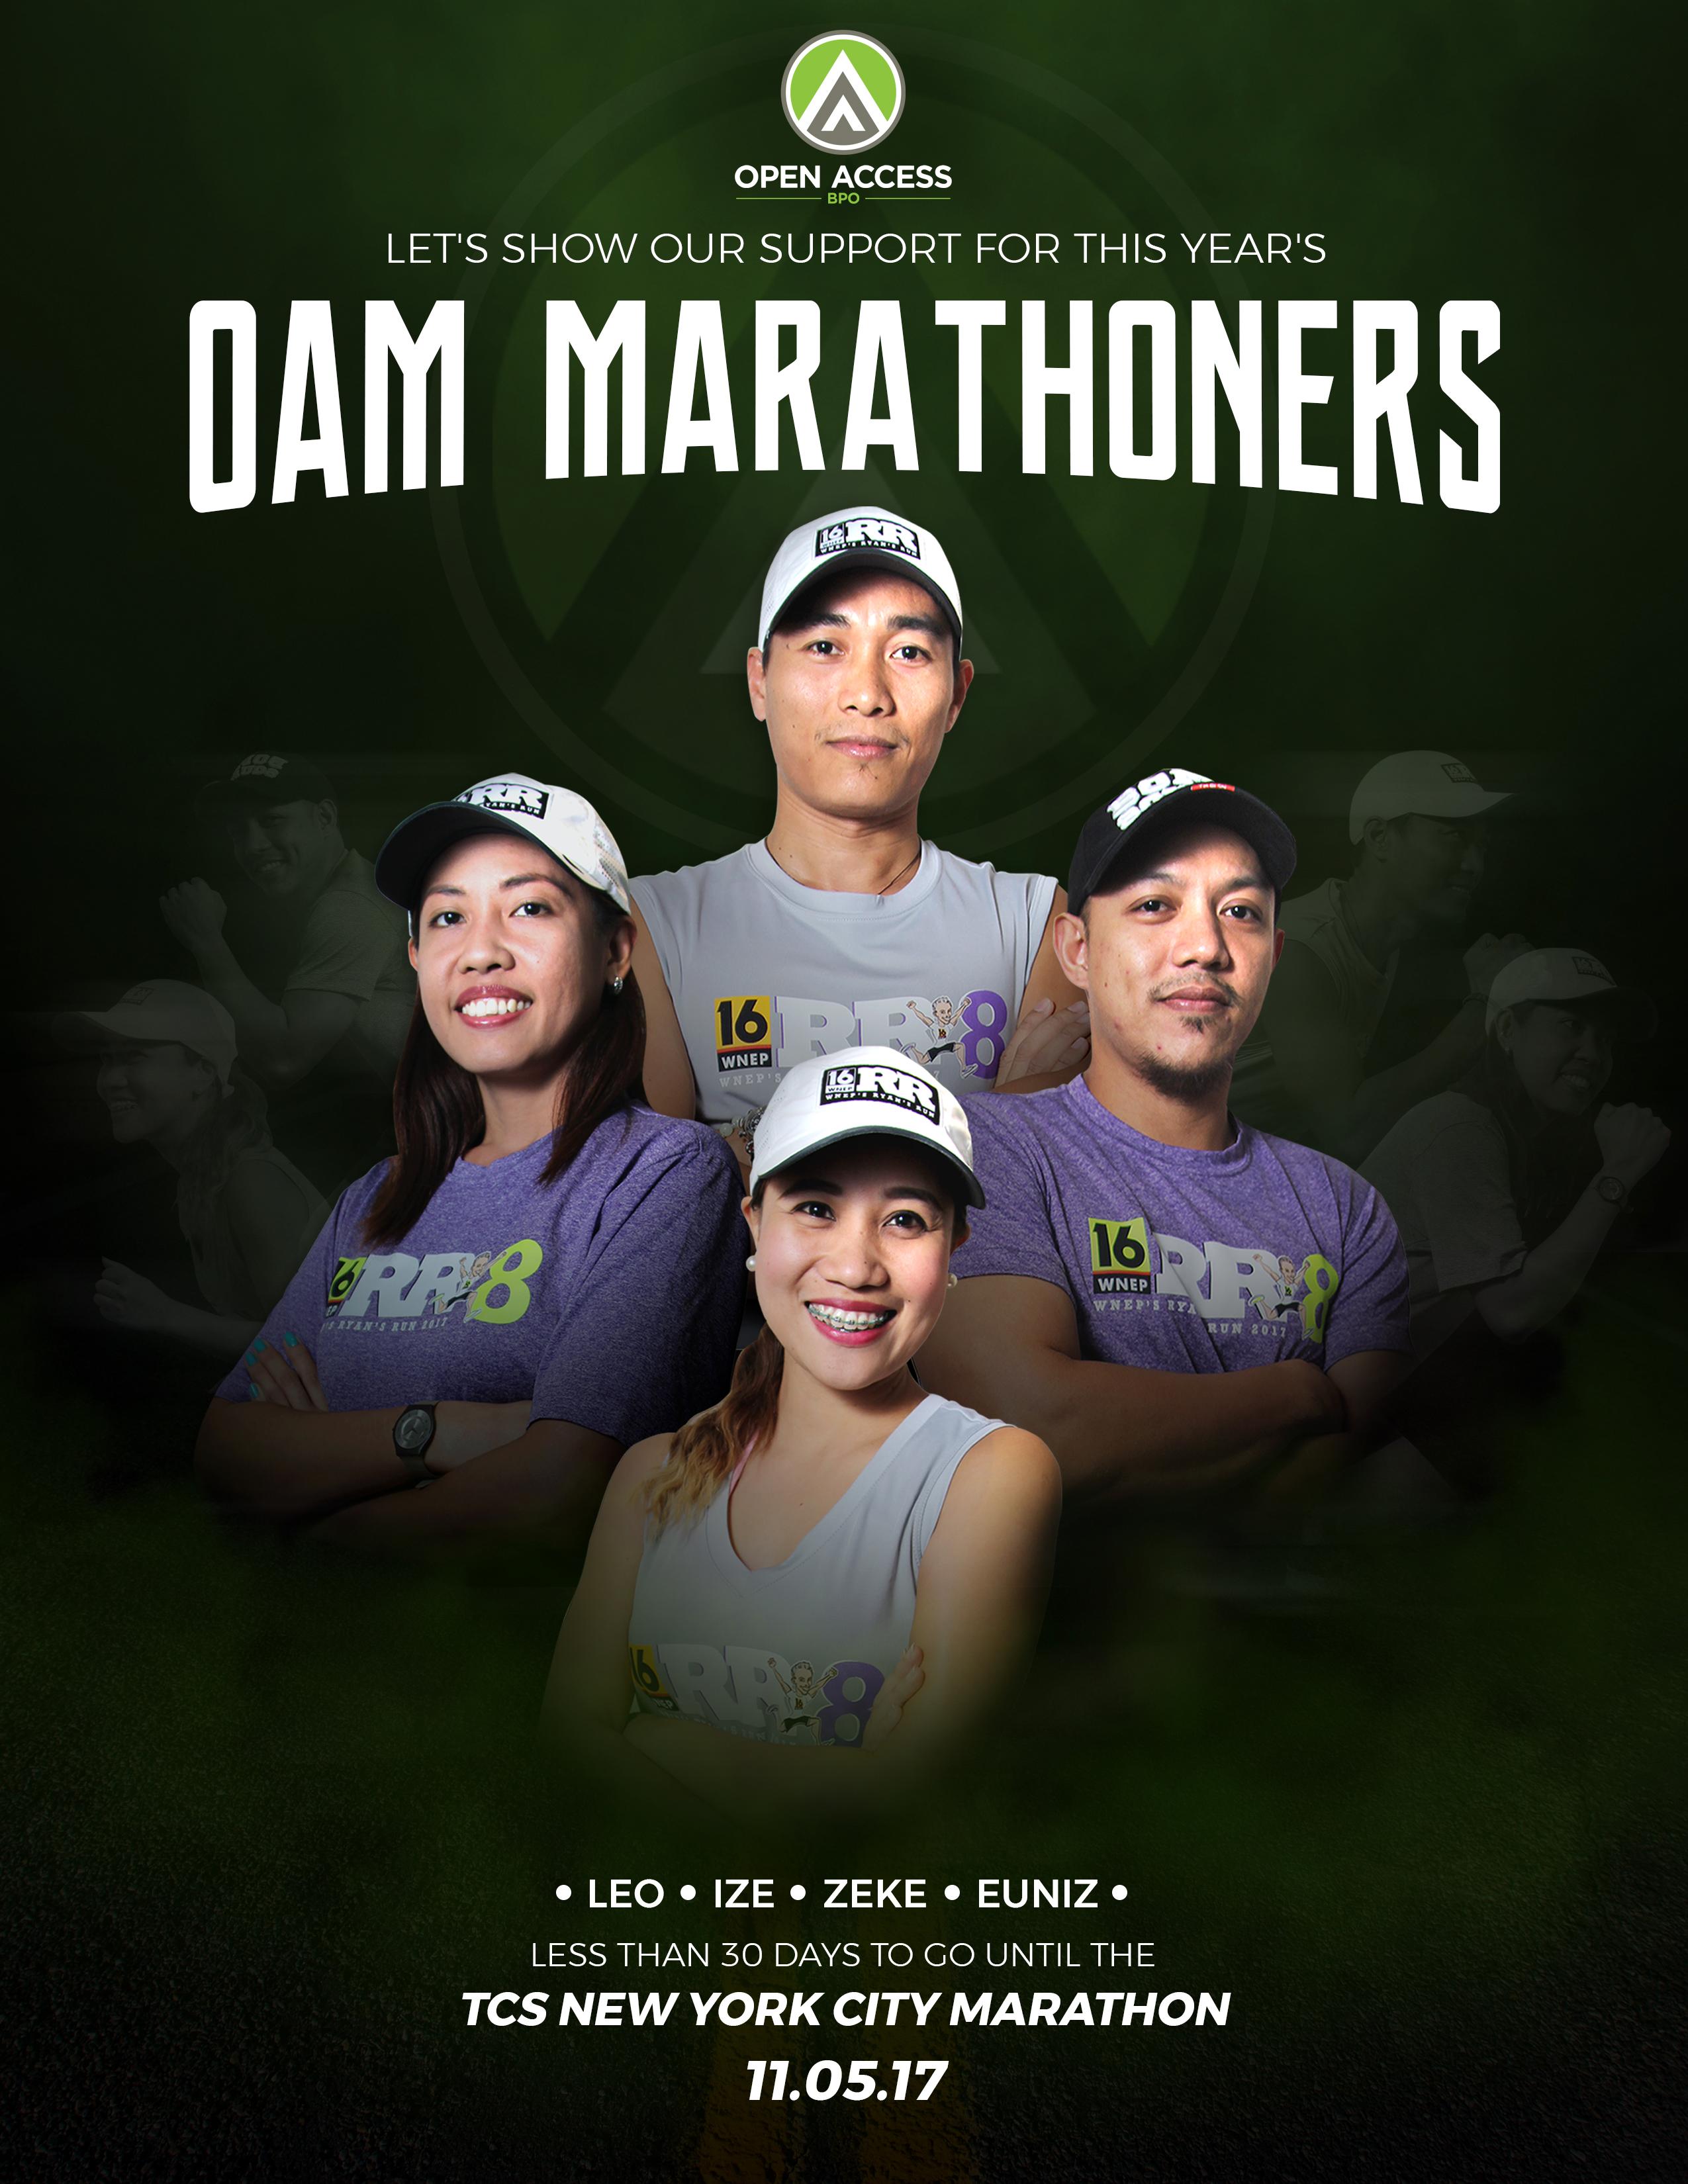 oam-marathoners-2017